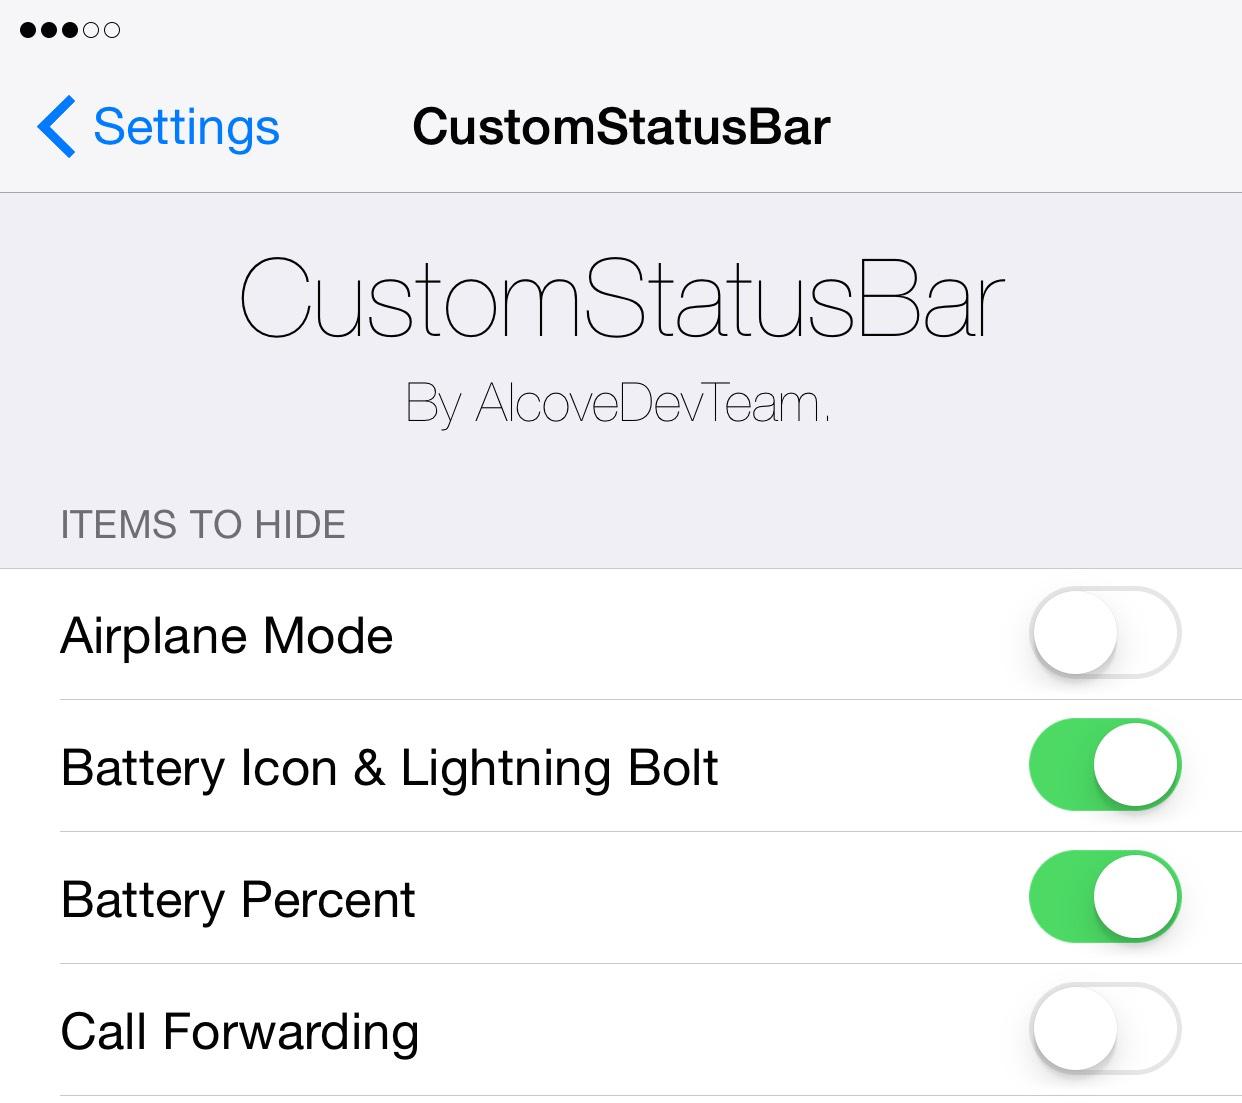 CustomStatusBar Preferences